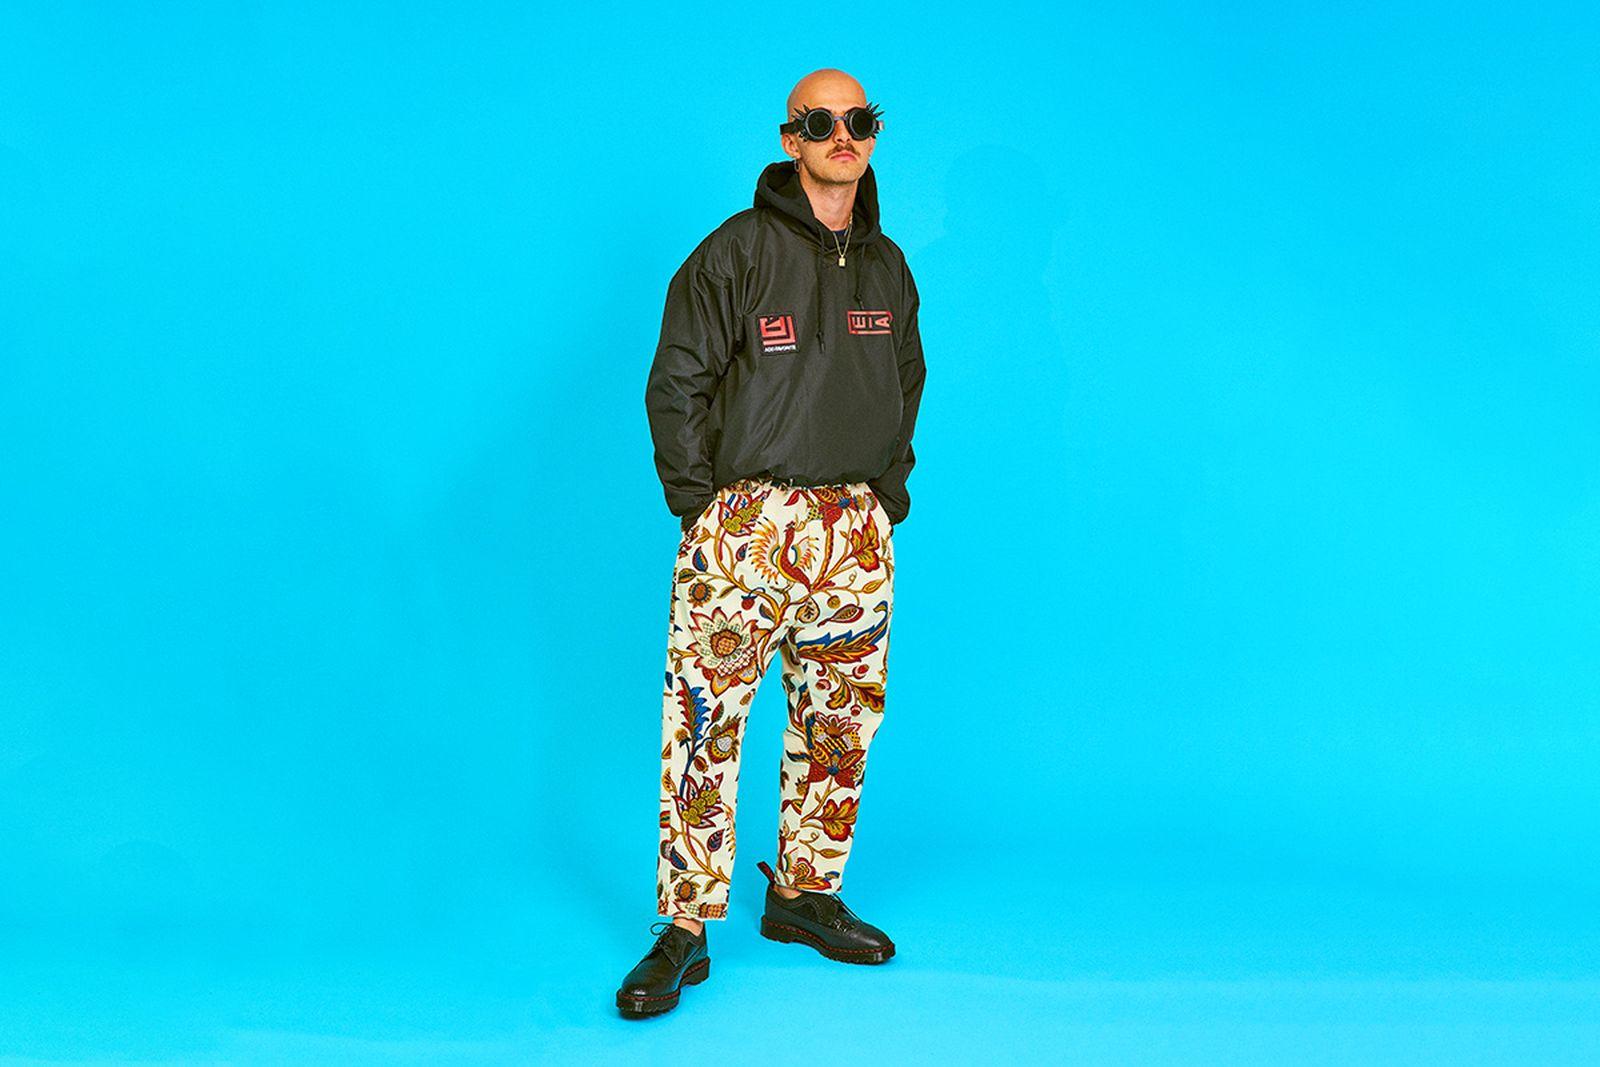 AiE SS20 paisley pants blue background